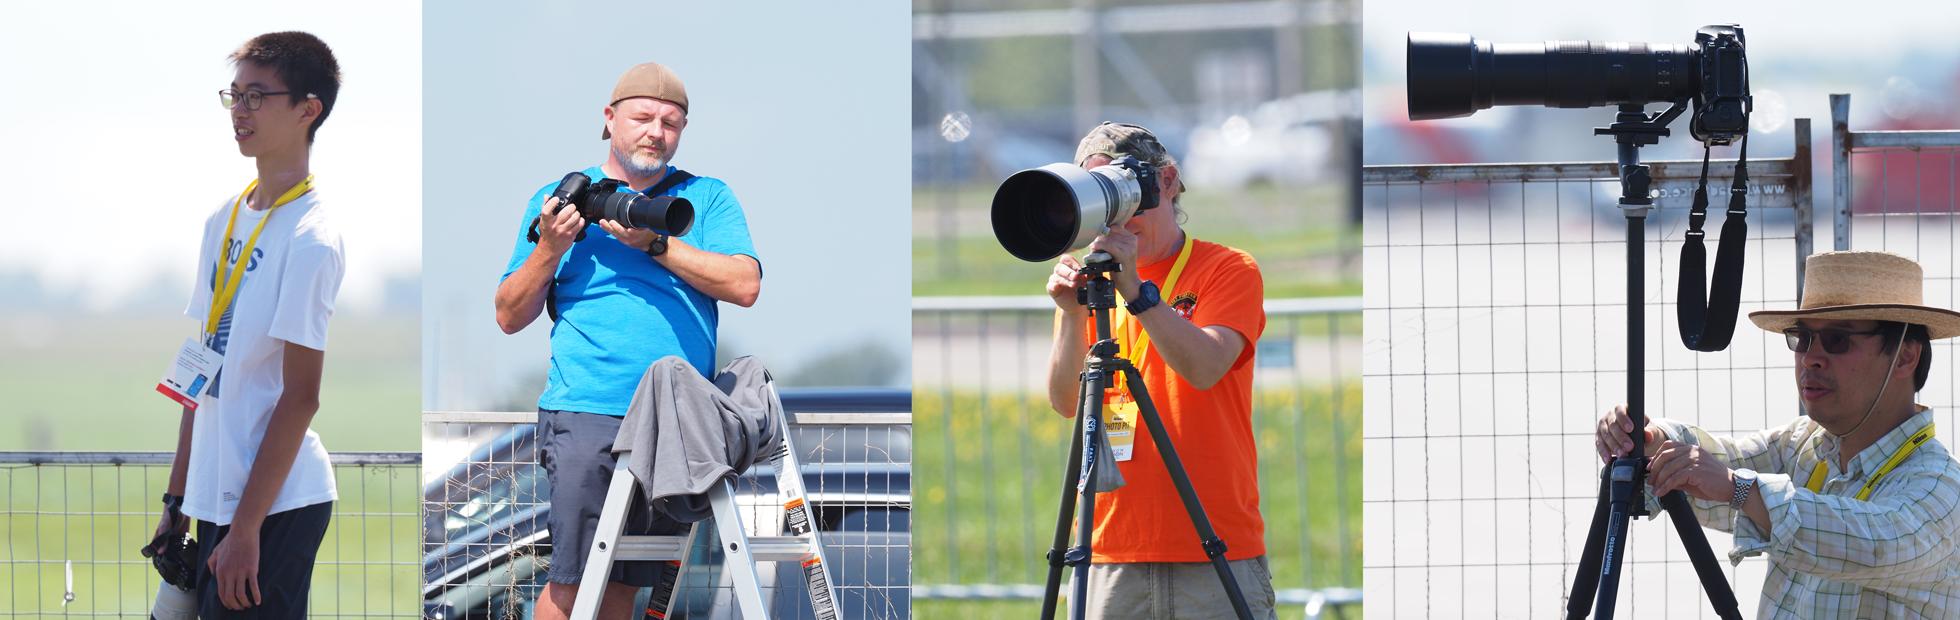 photographgers